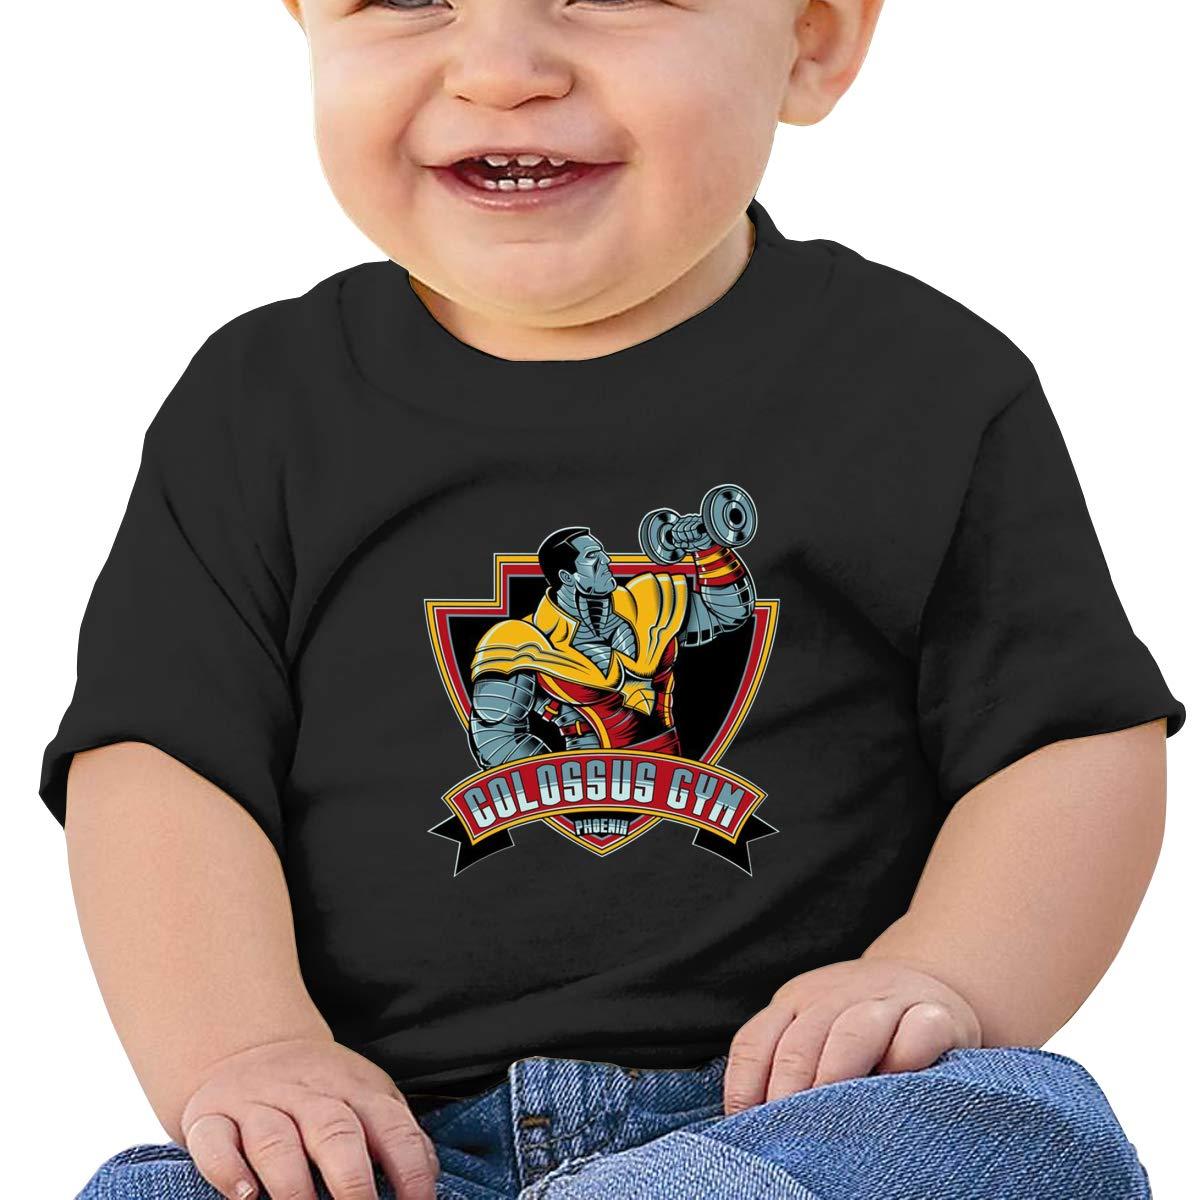 Colossus Gym Phoenix Toddler Short-Sleeve Tee for Boy Girl Infant Kids T-Shirt On Newborn 6-18 Months